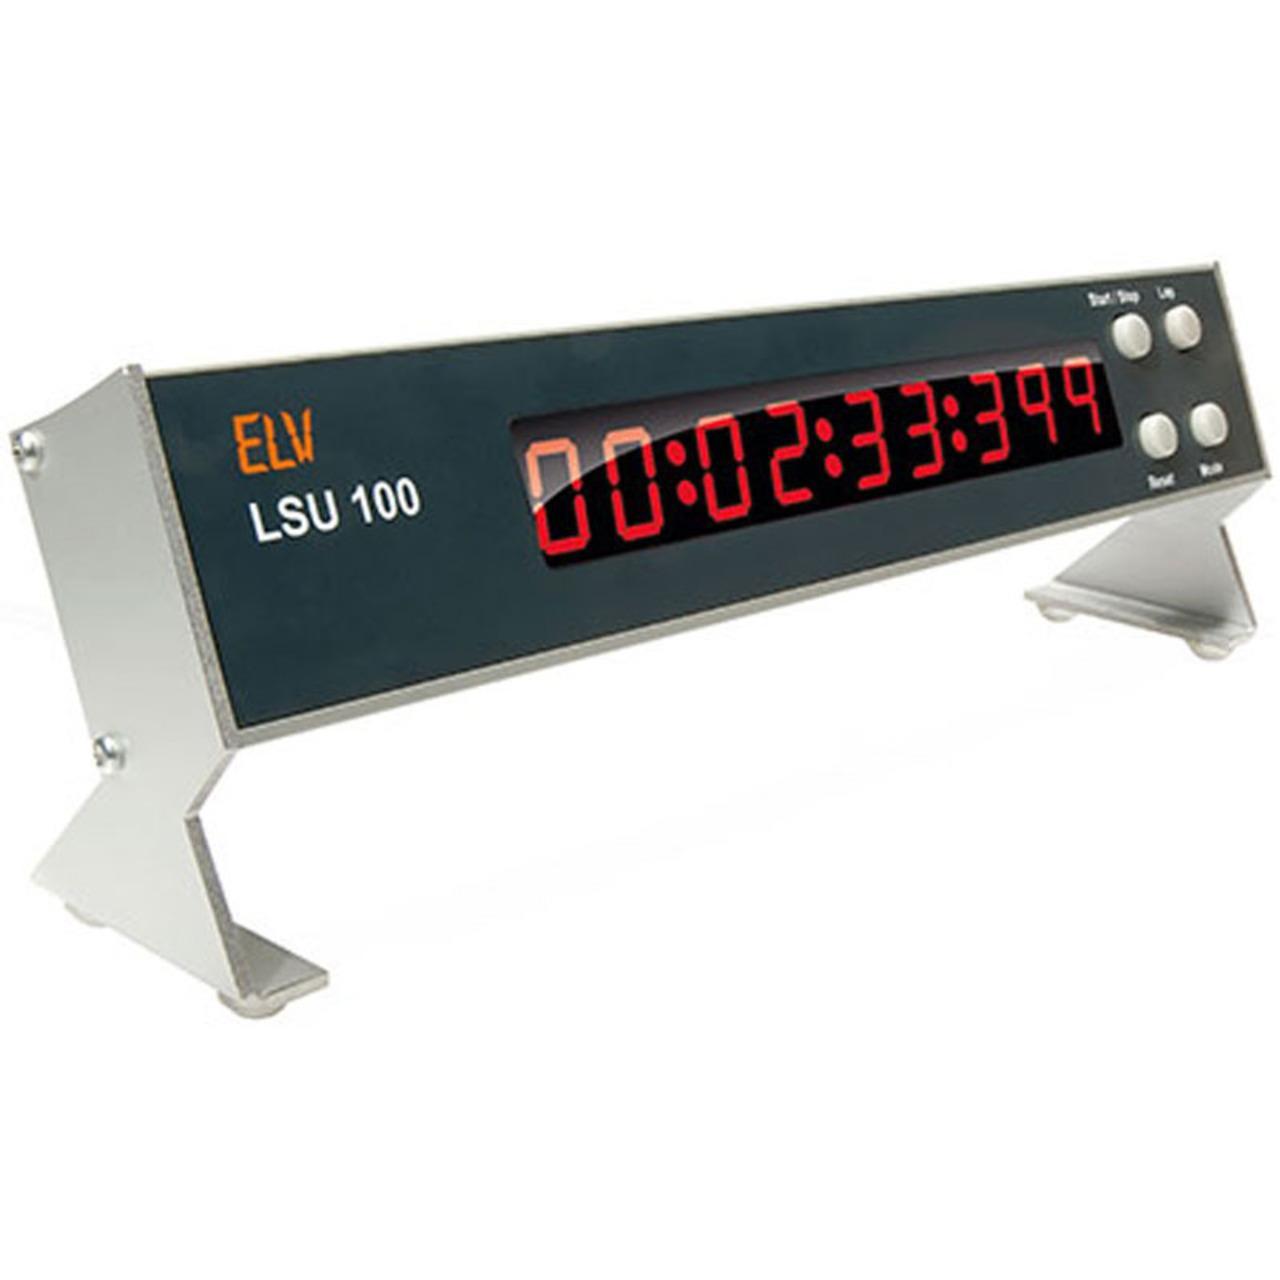 ELV LED-Stoppuhr LSU 100